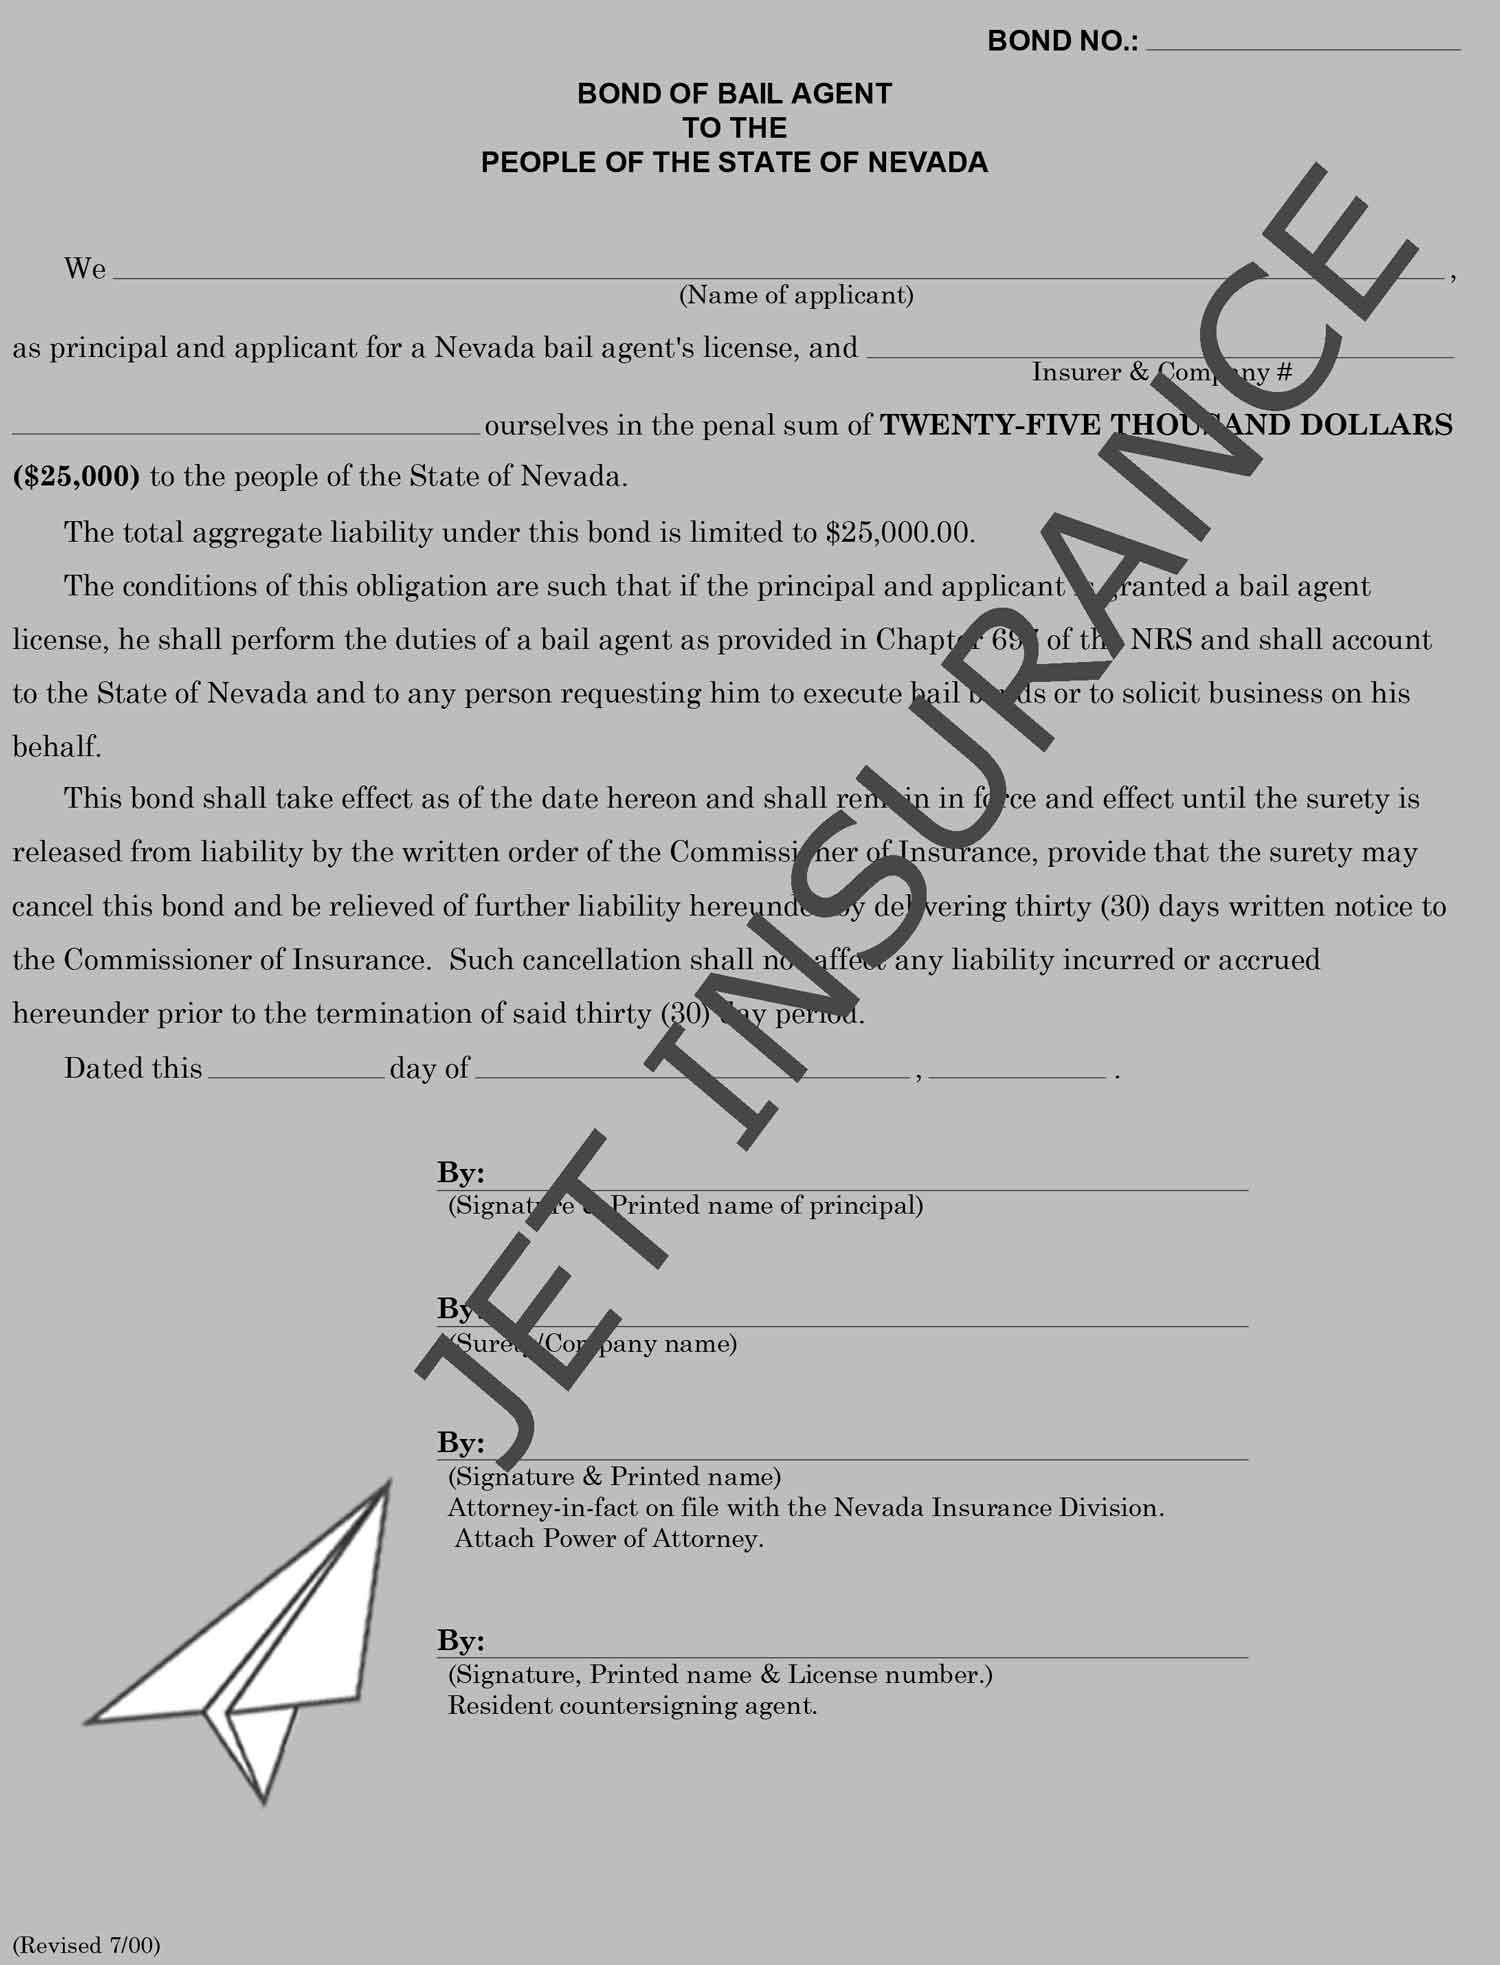 Nevada Bail Agent License Bond Form